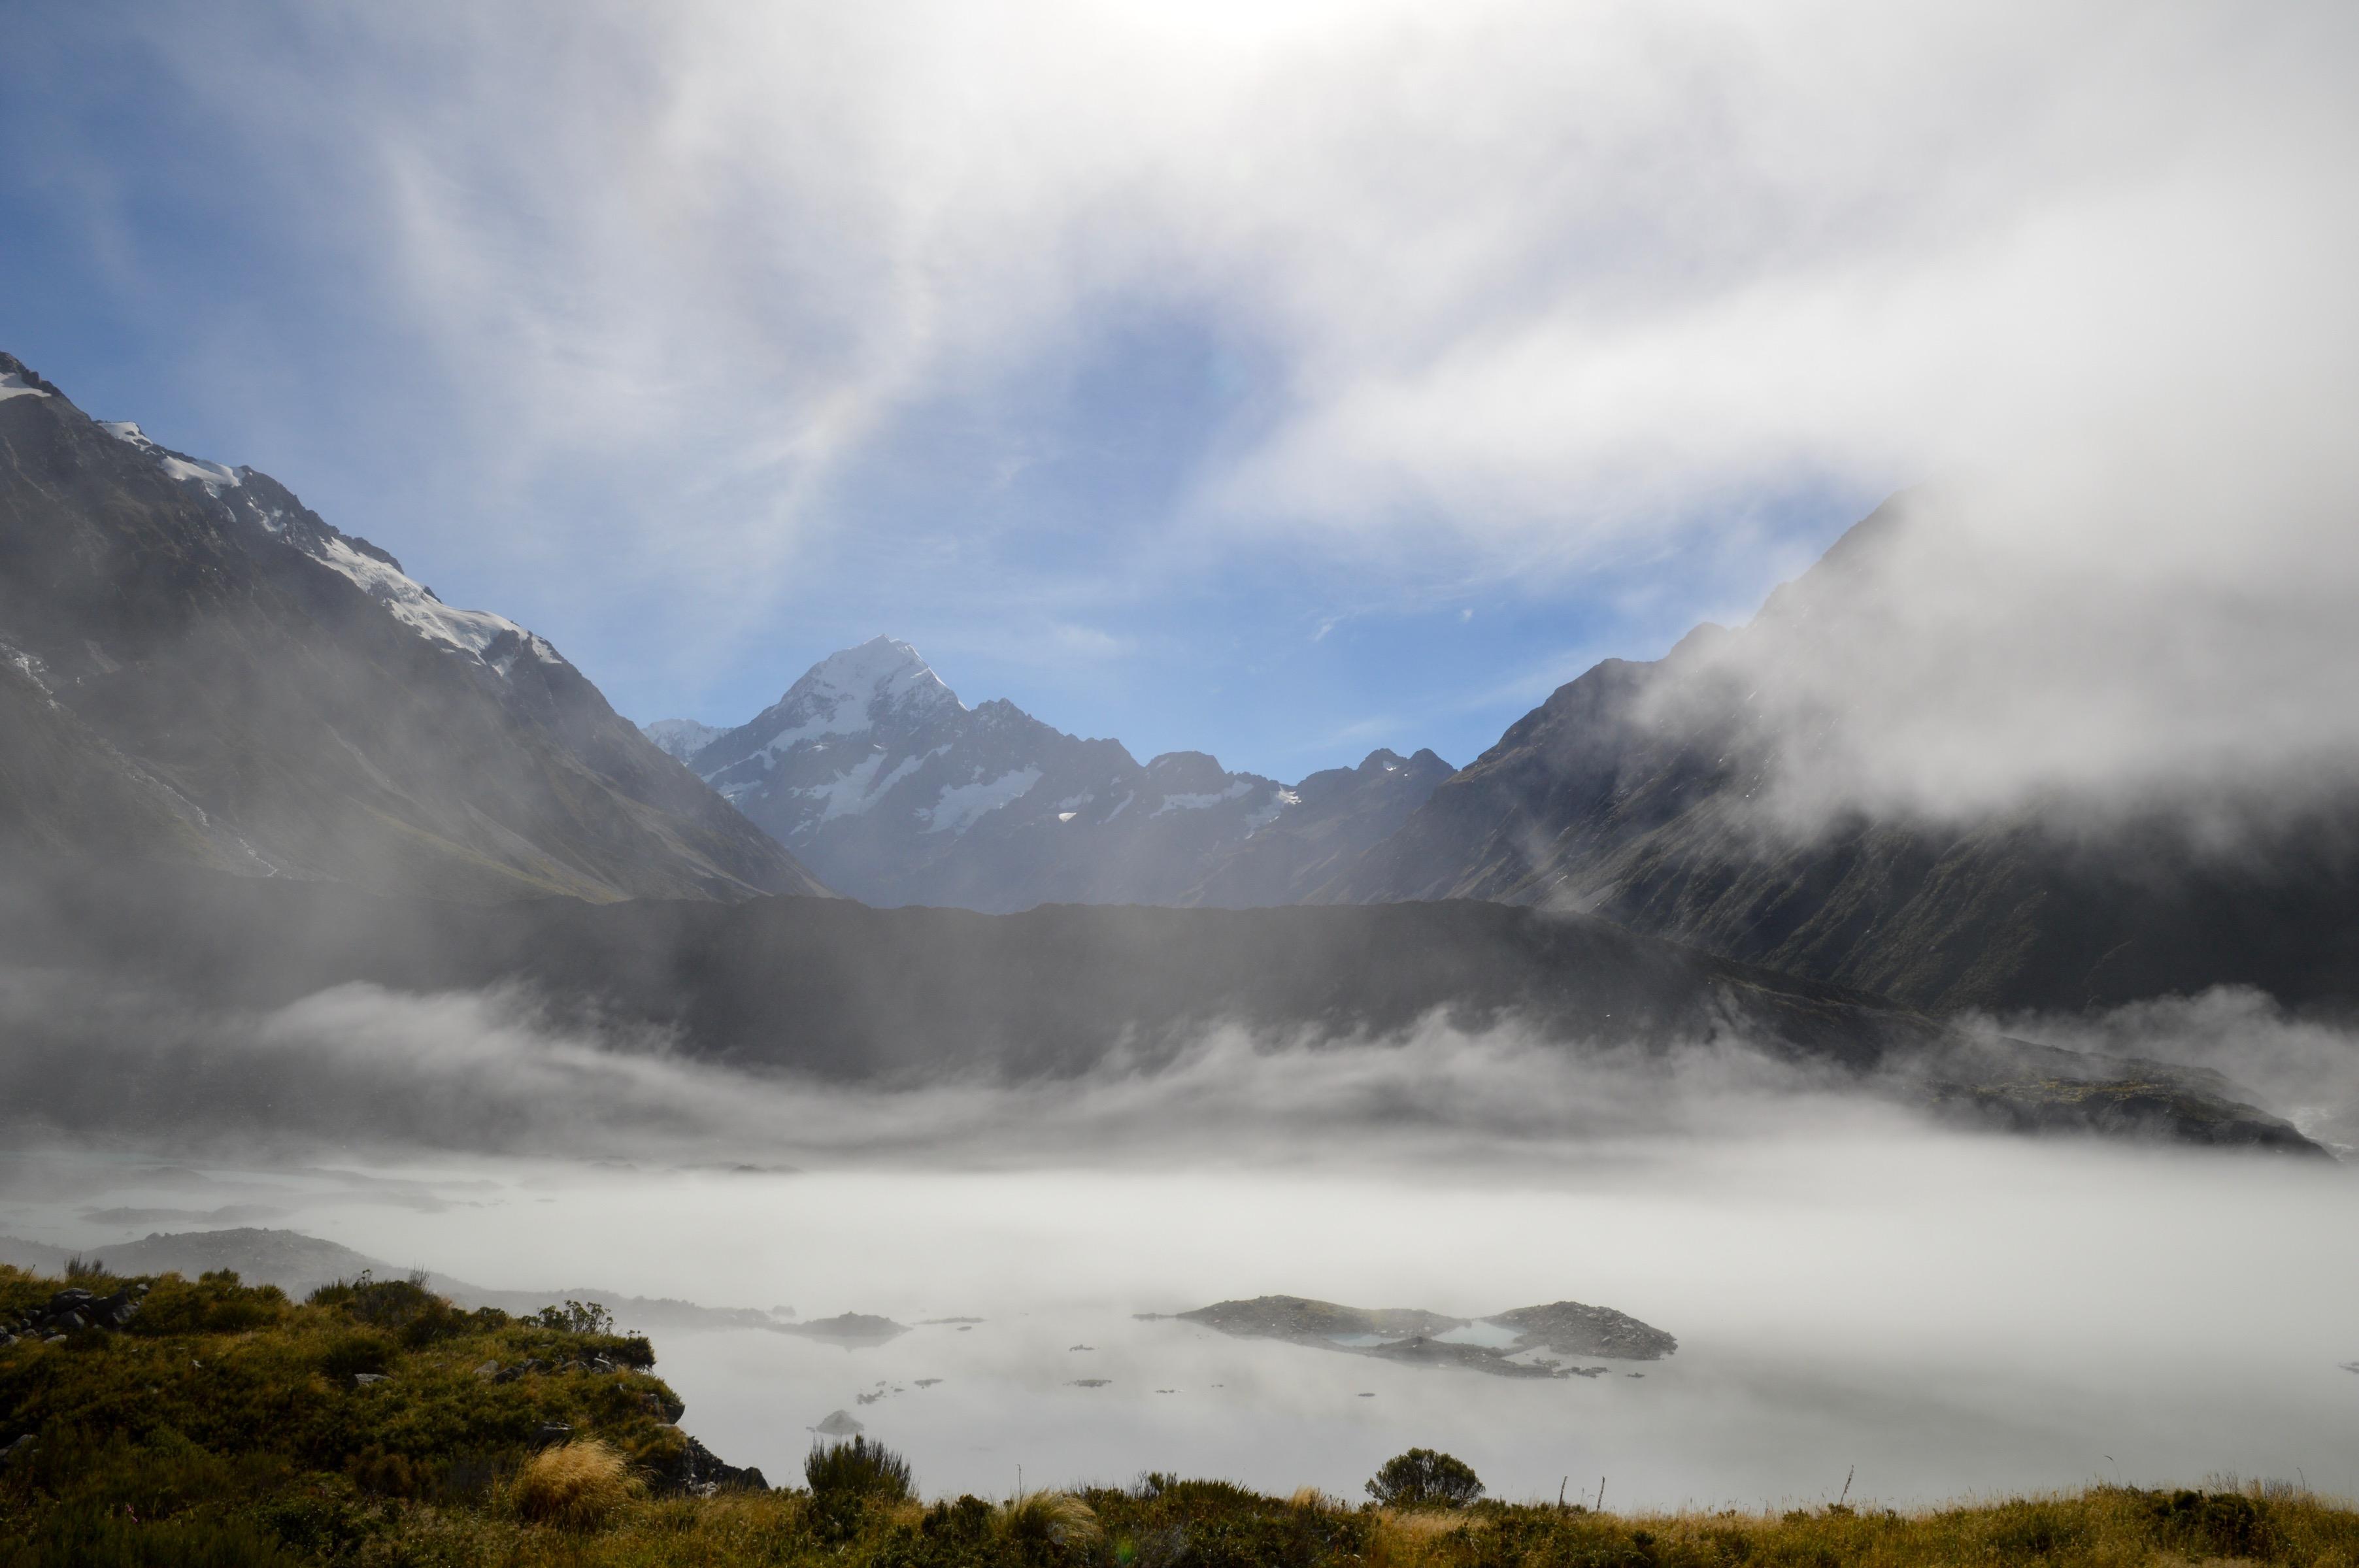 Kea Point, Aoraki/Mount Cook National Park, New Zealand